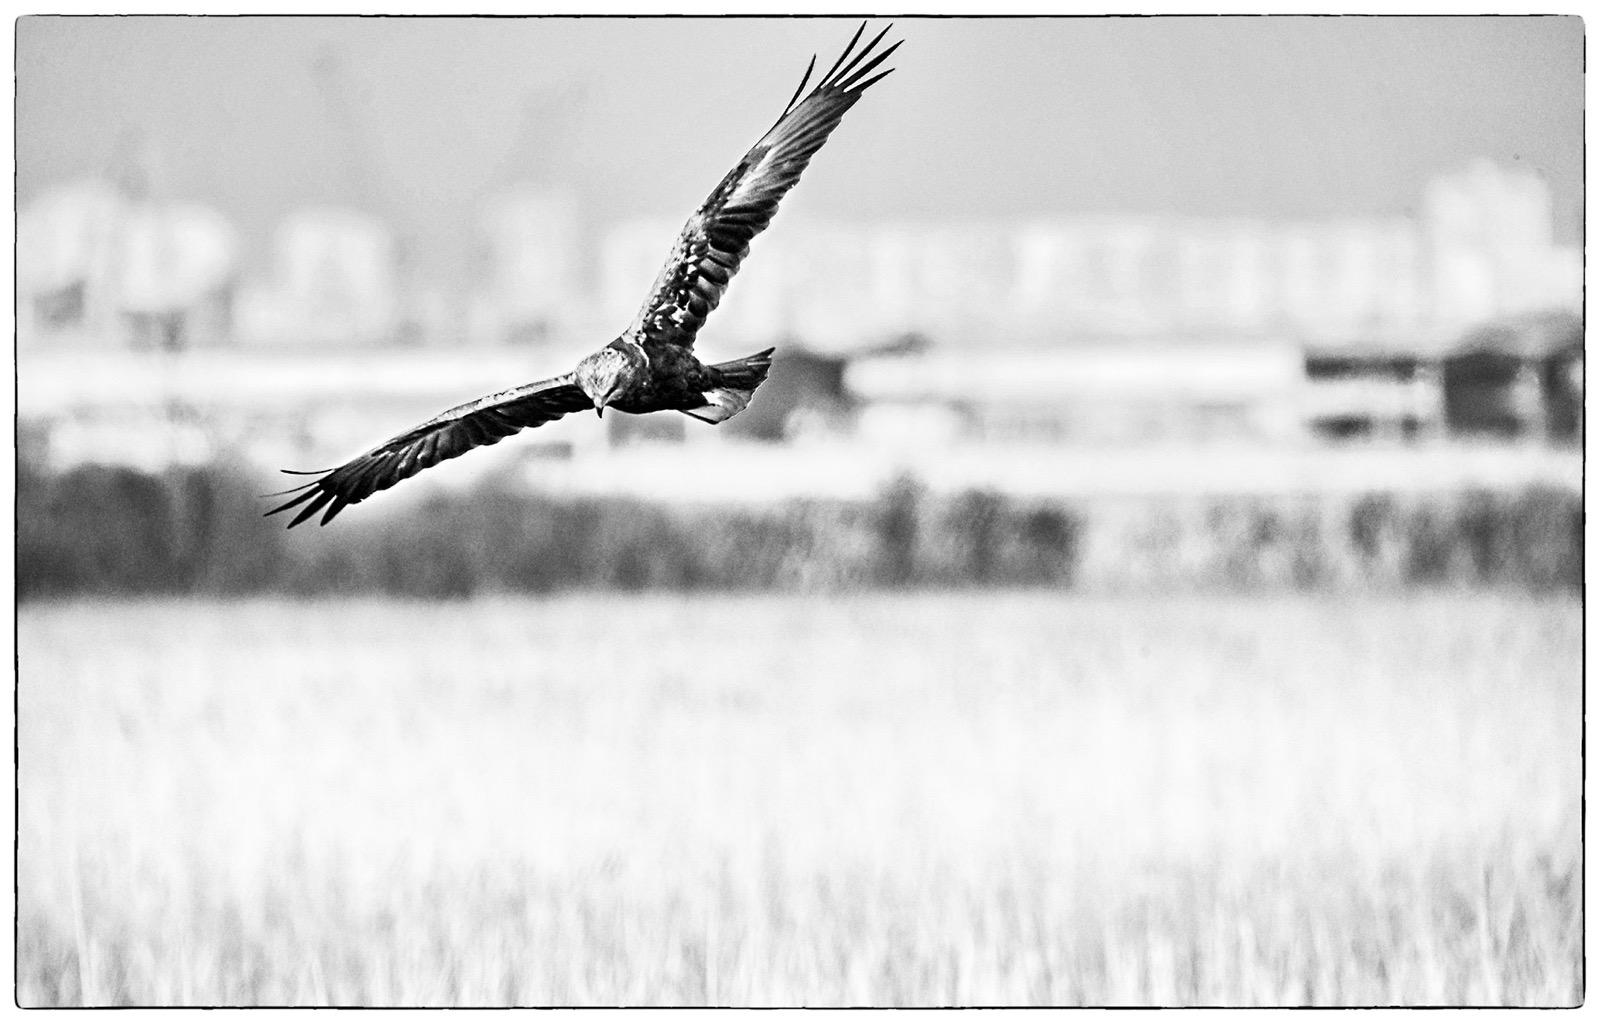 Hunting Marsh harrier reed-bed Poda lagoon wetland reserve Burgas